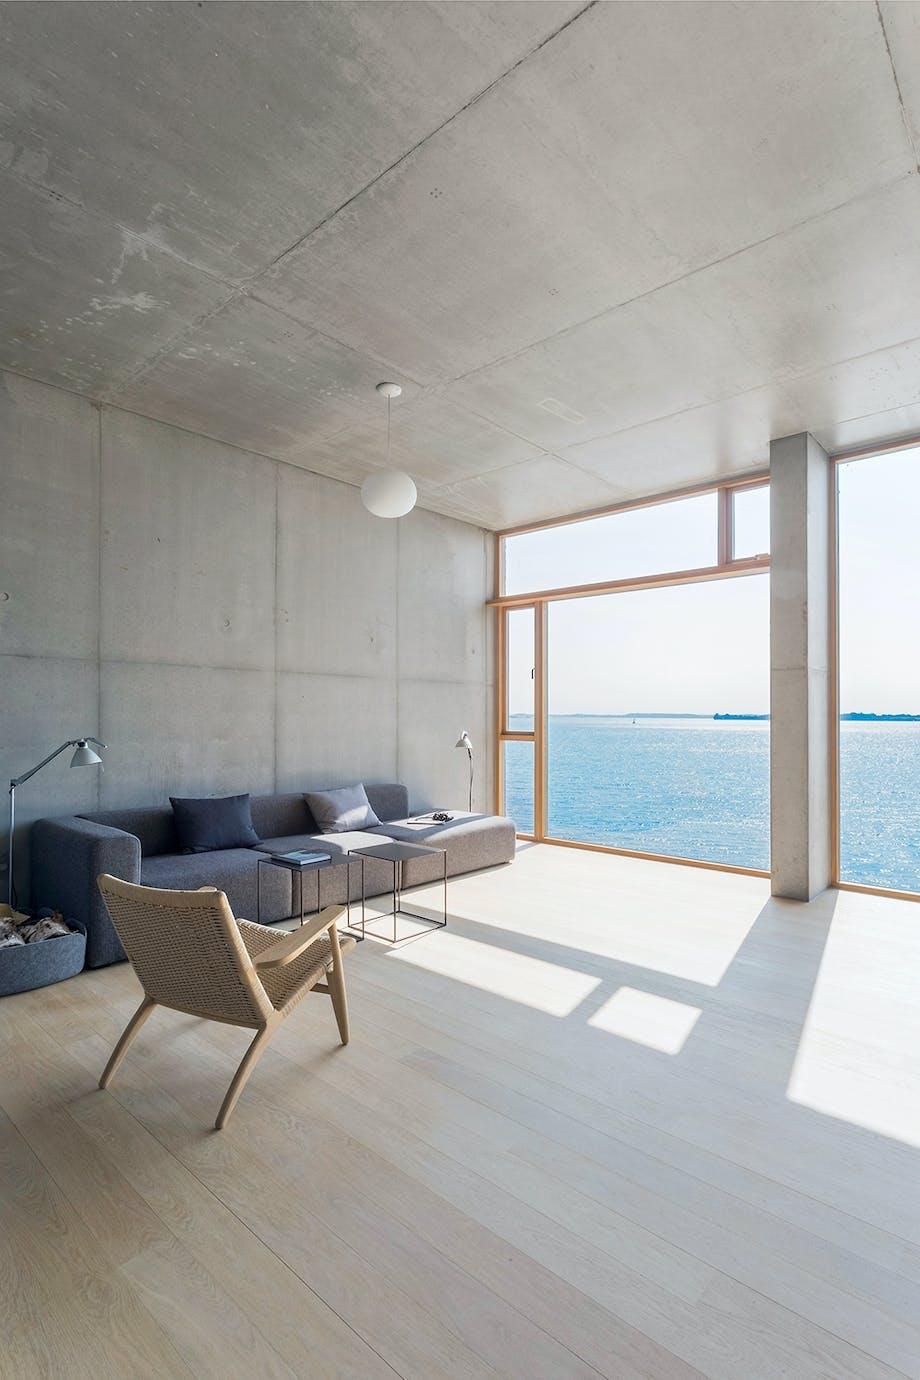 Stue Beton sofa fra HAY lænestol fra Hans J. Wegner Flensborg Fjord